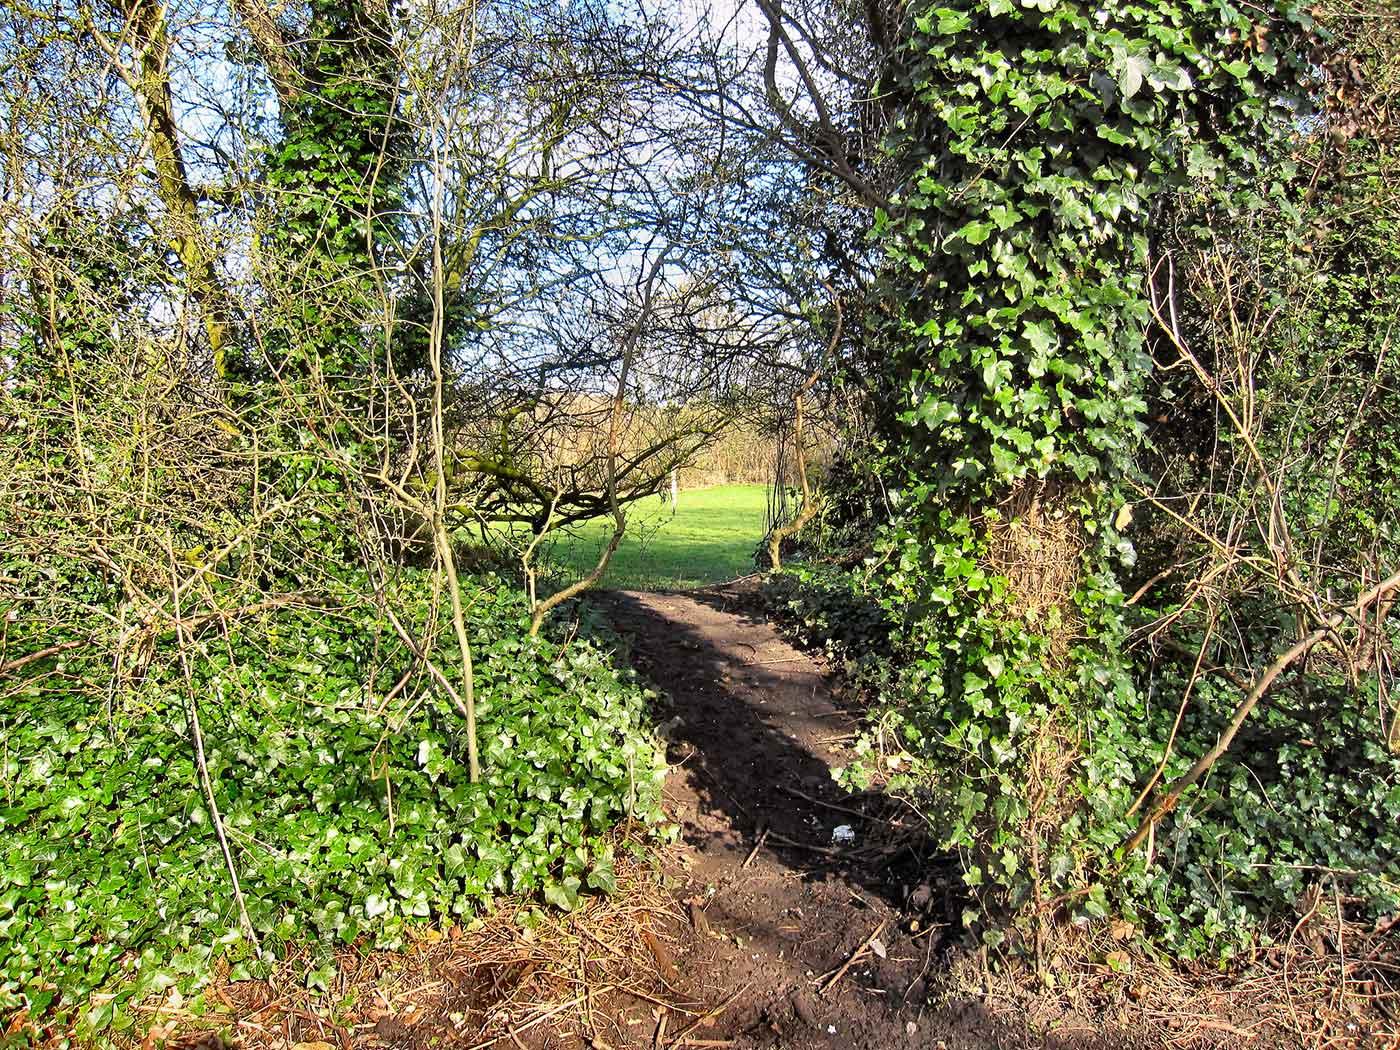 Shortcut through trees